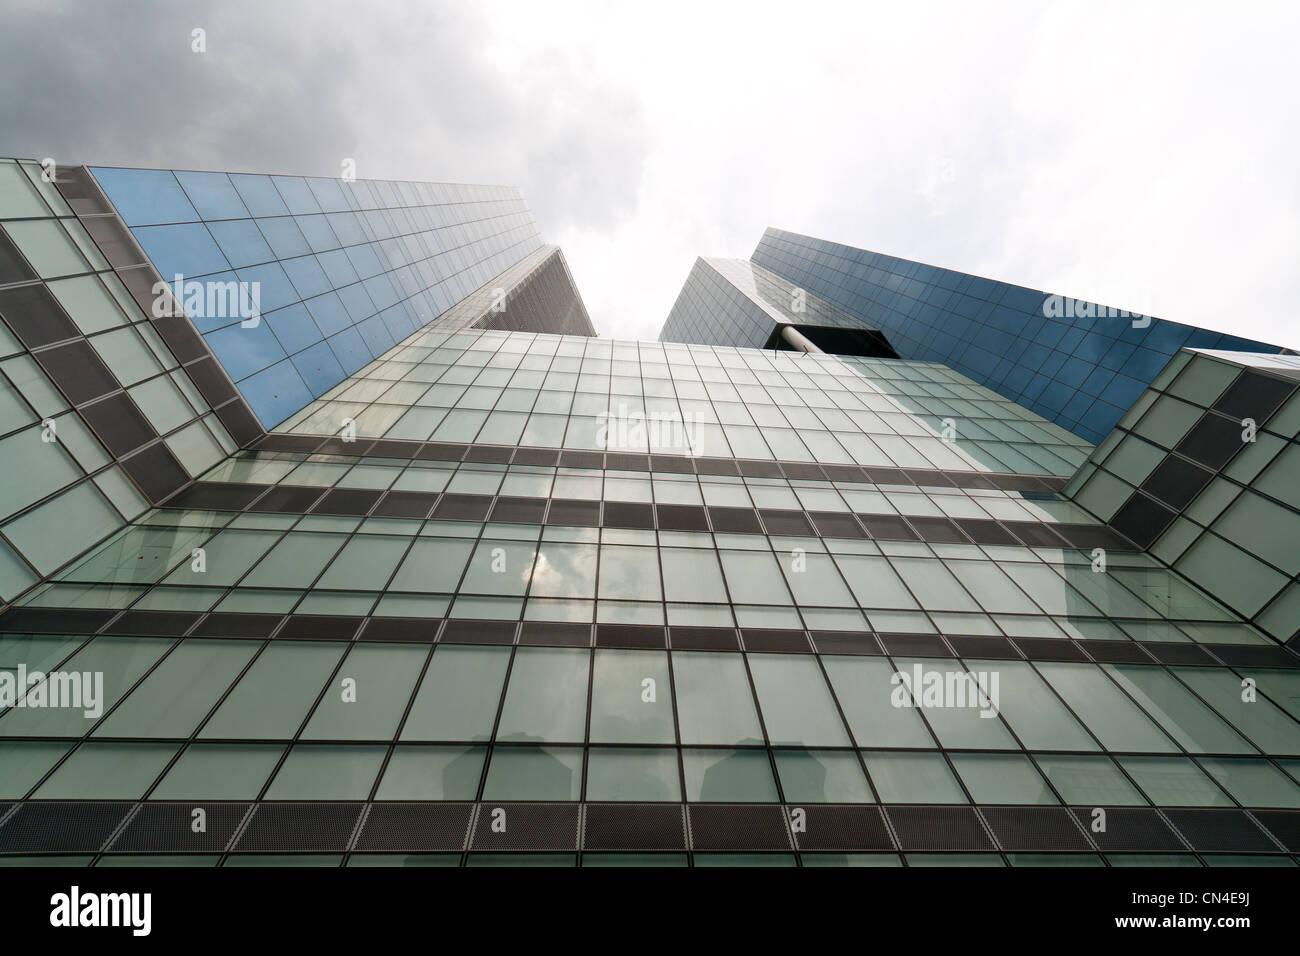 Looking upwards an exterior of a modern skyscraper - Stock Image